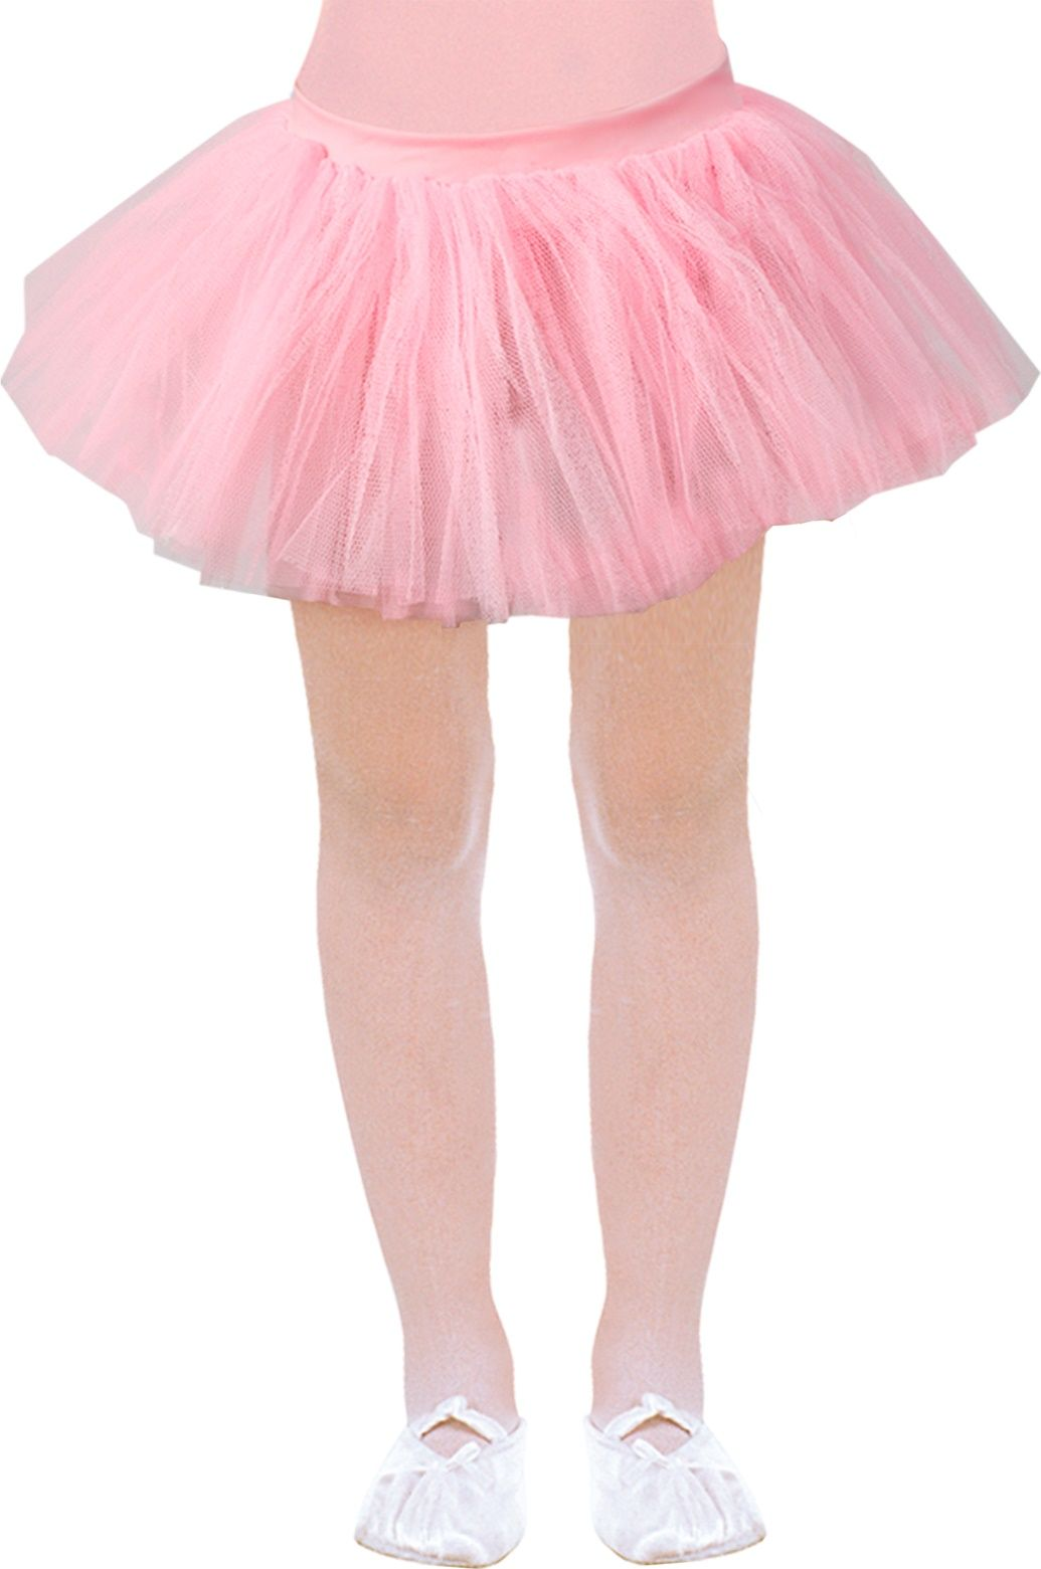 Roze ballerina tutu